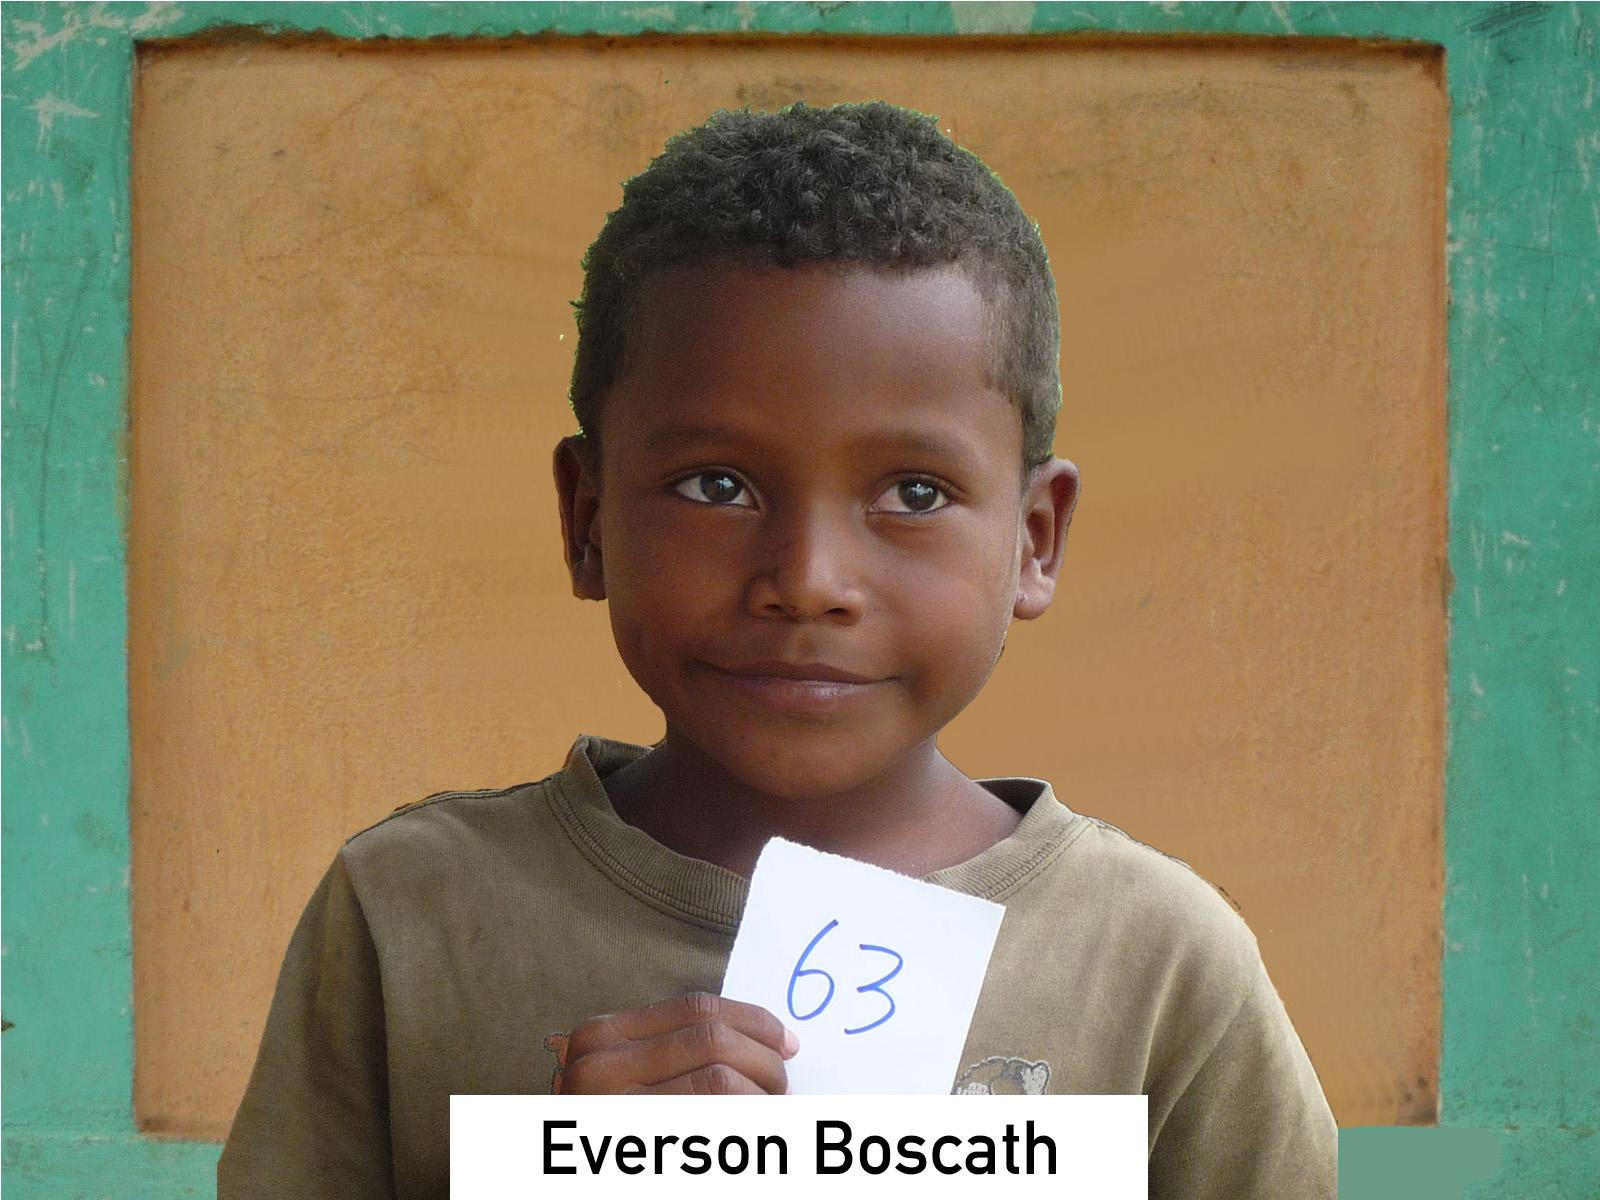 063 - Everson Boscath.jpg